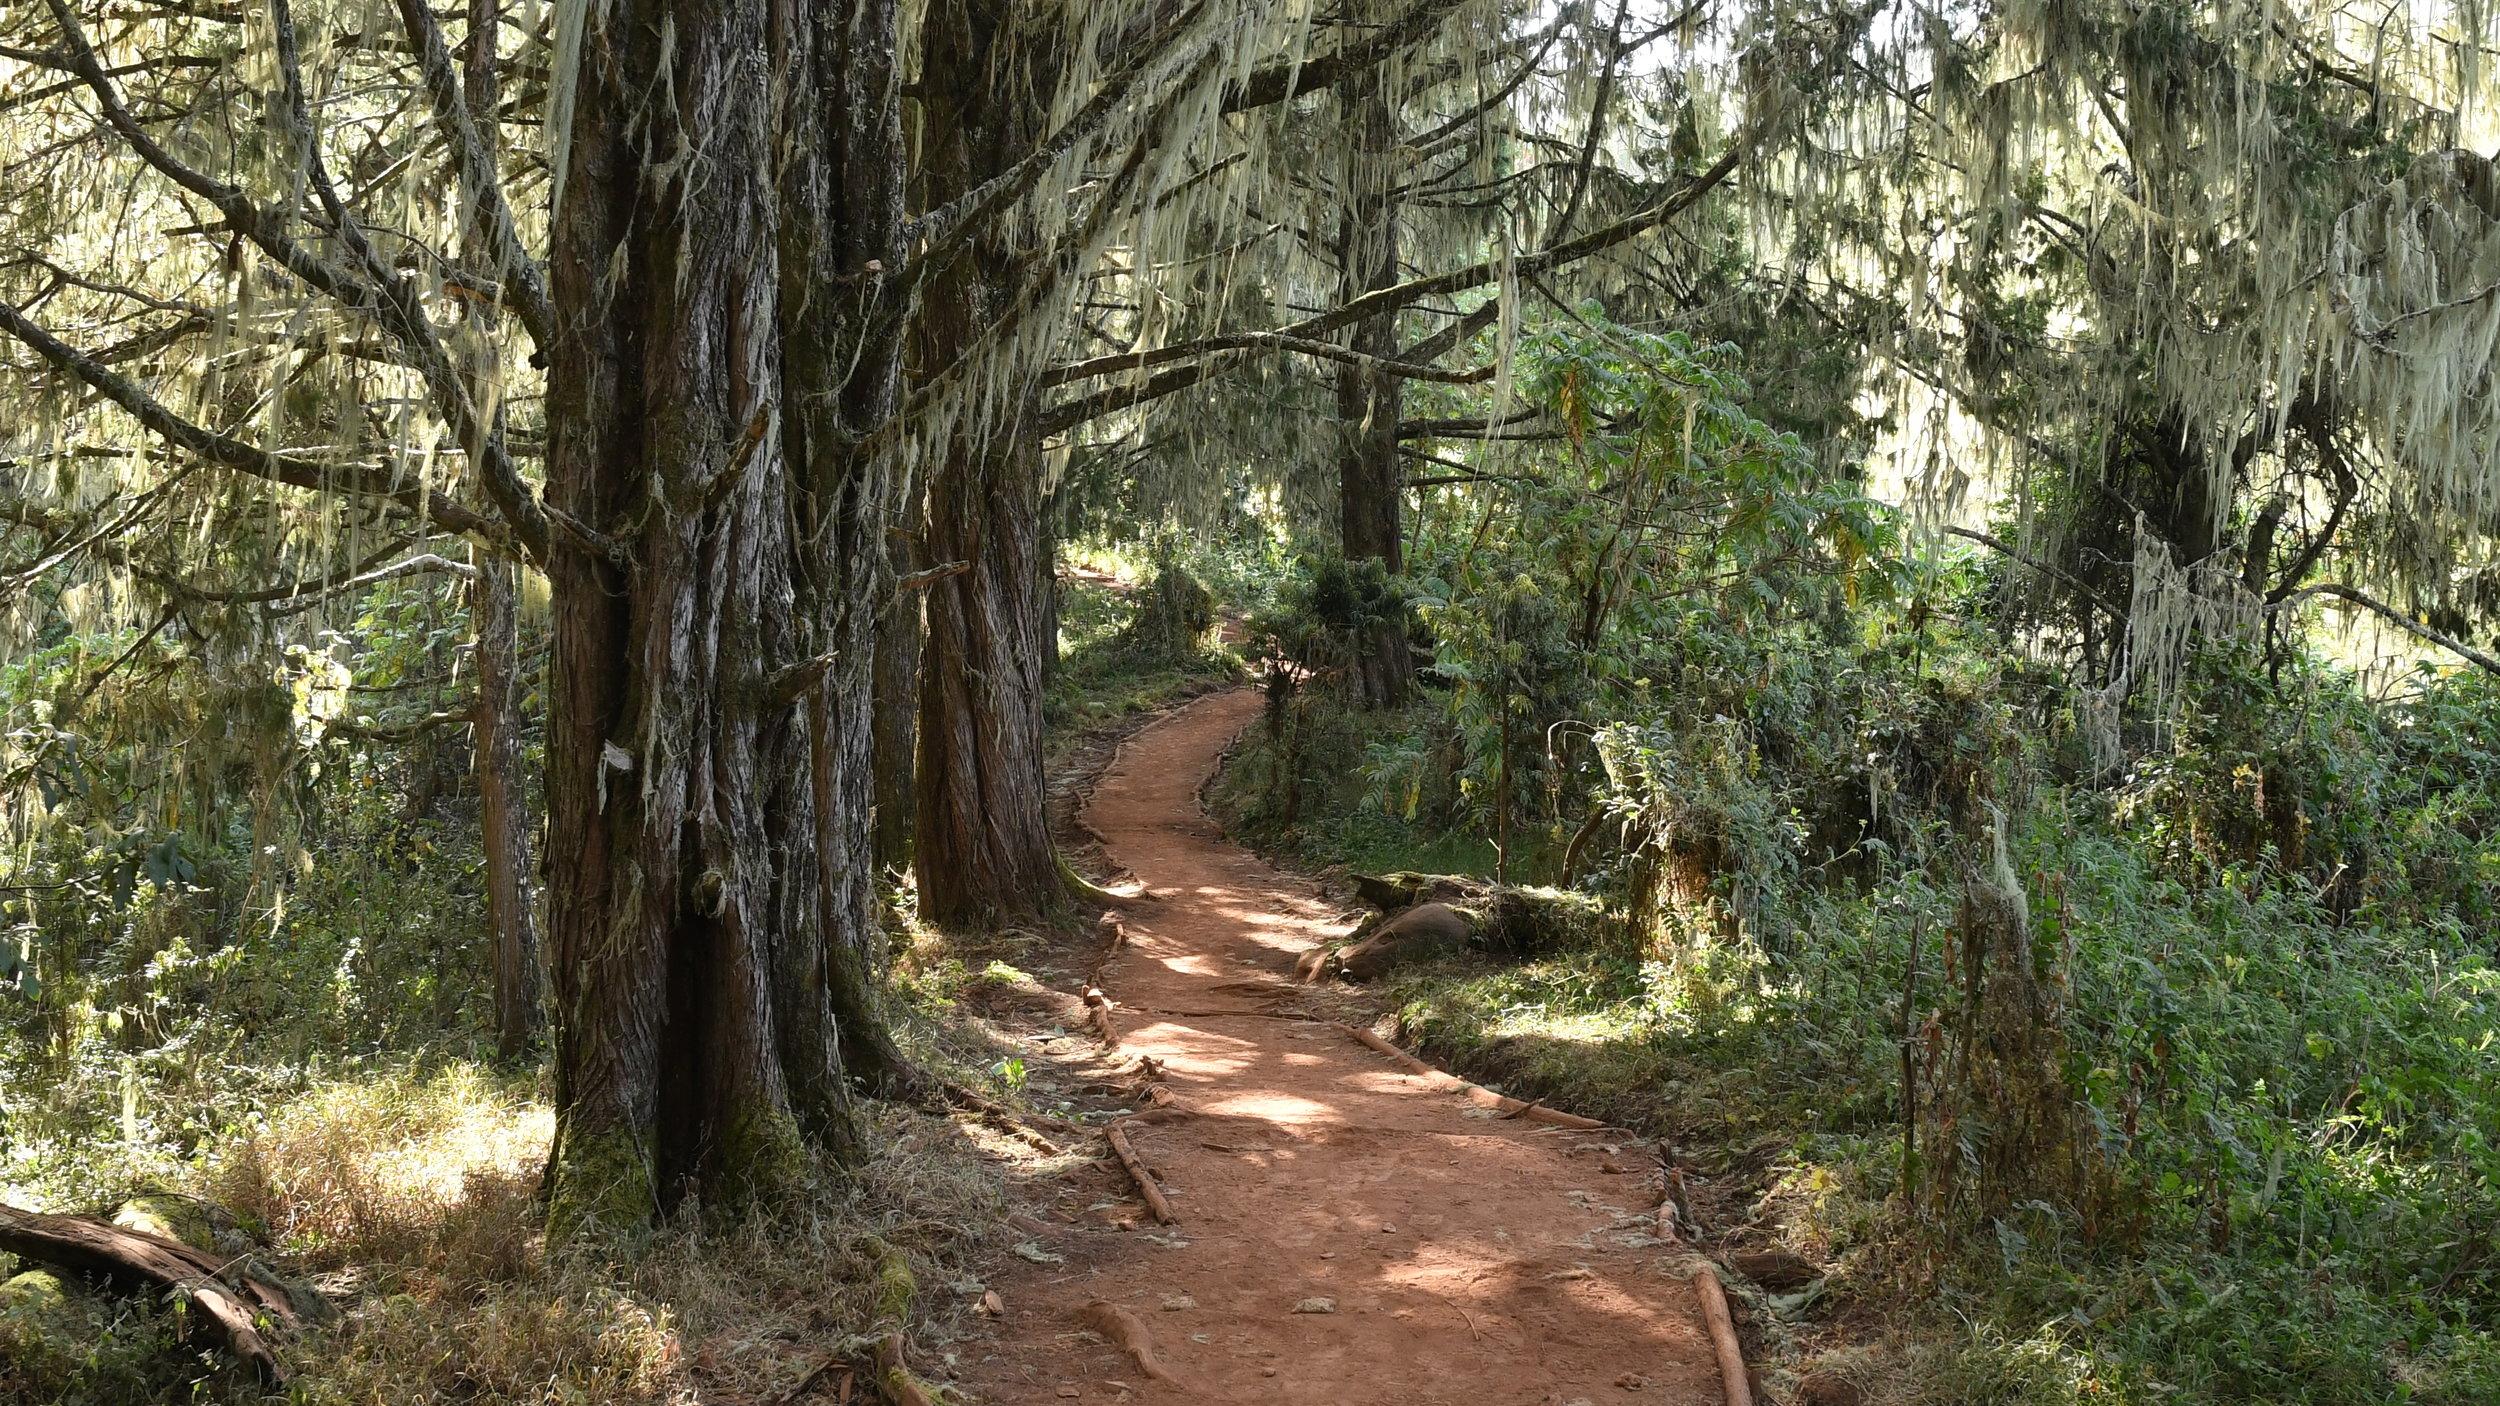 Day 3 / Podocarpus and Juniper Forest